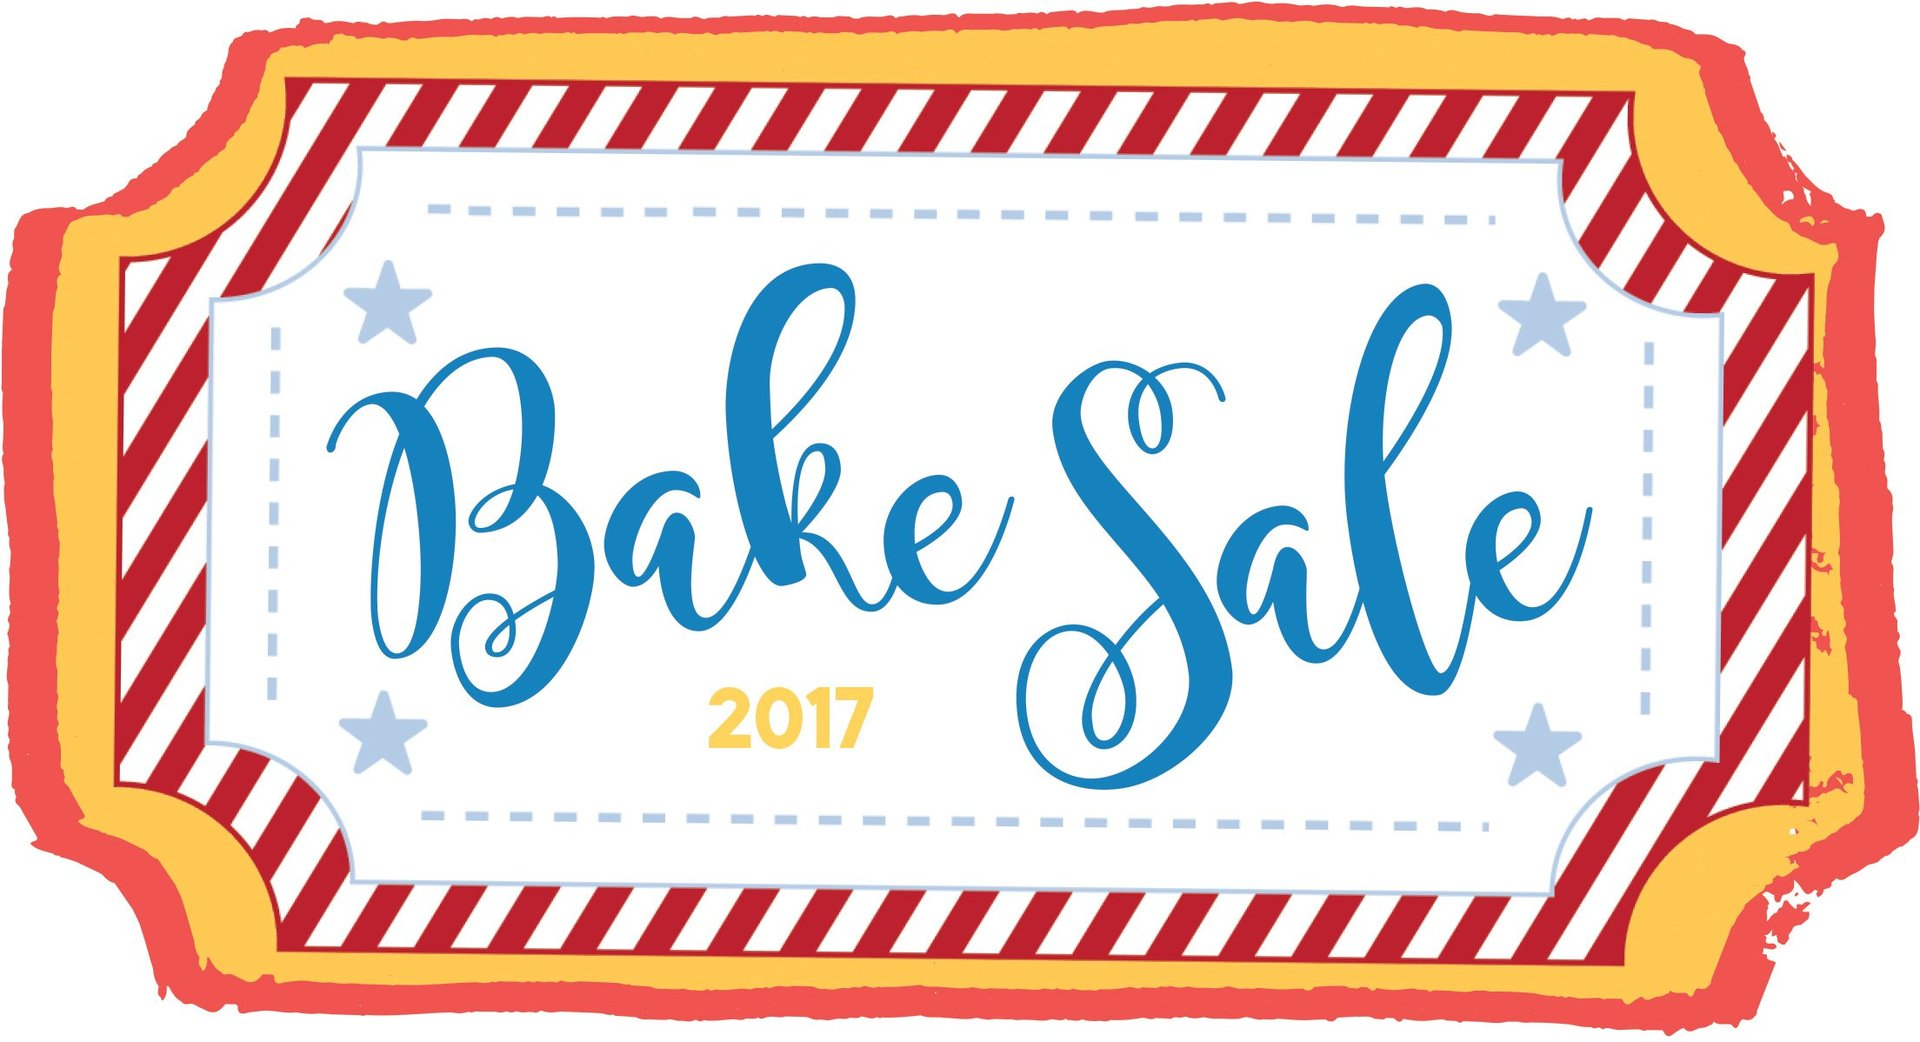 1920x1042 Club Bake Sales